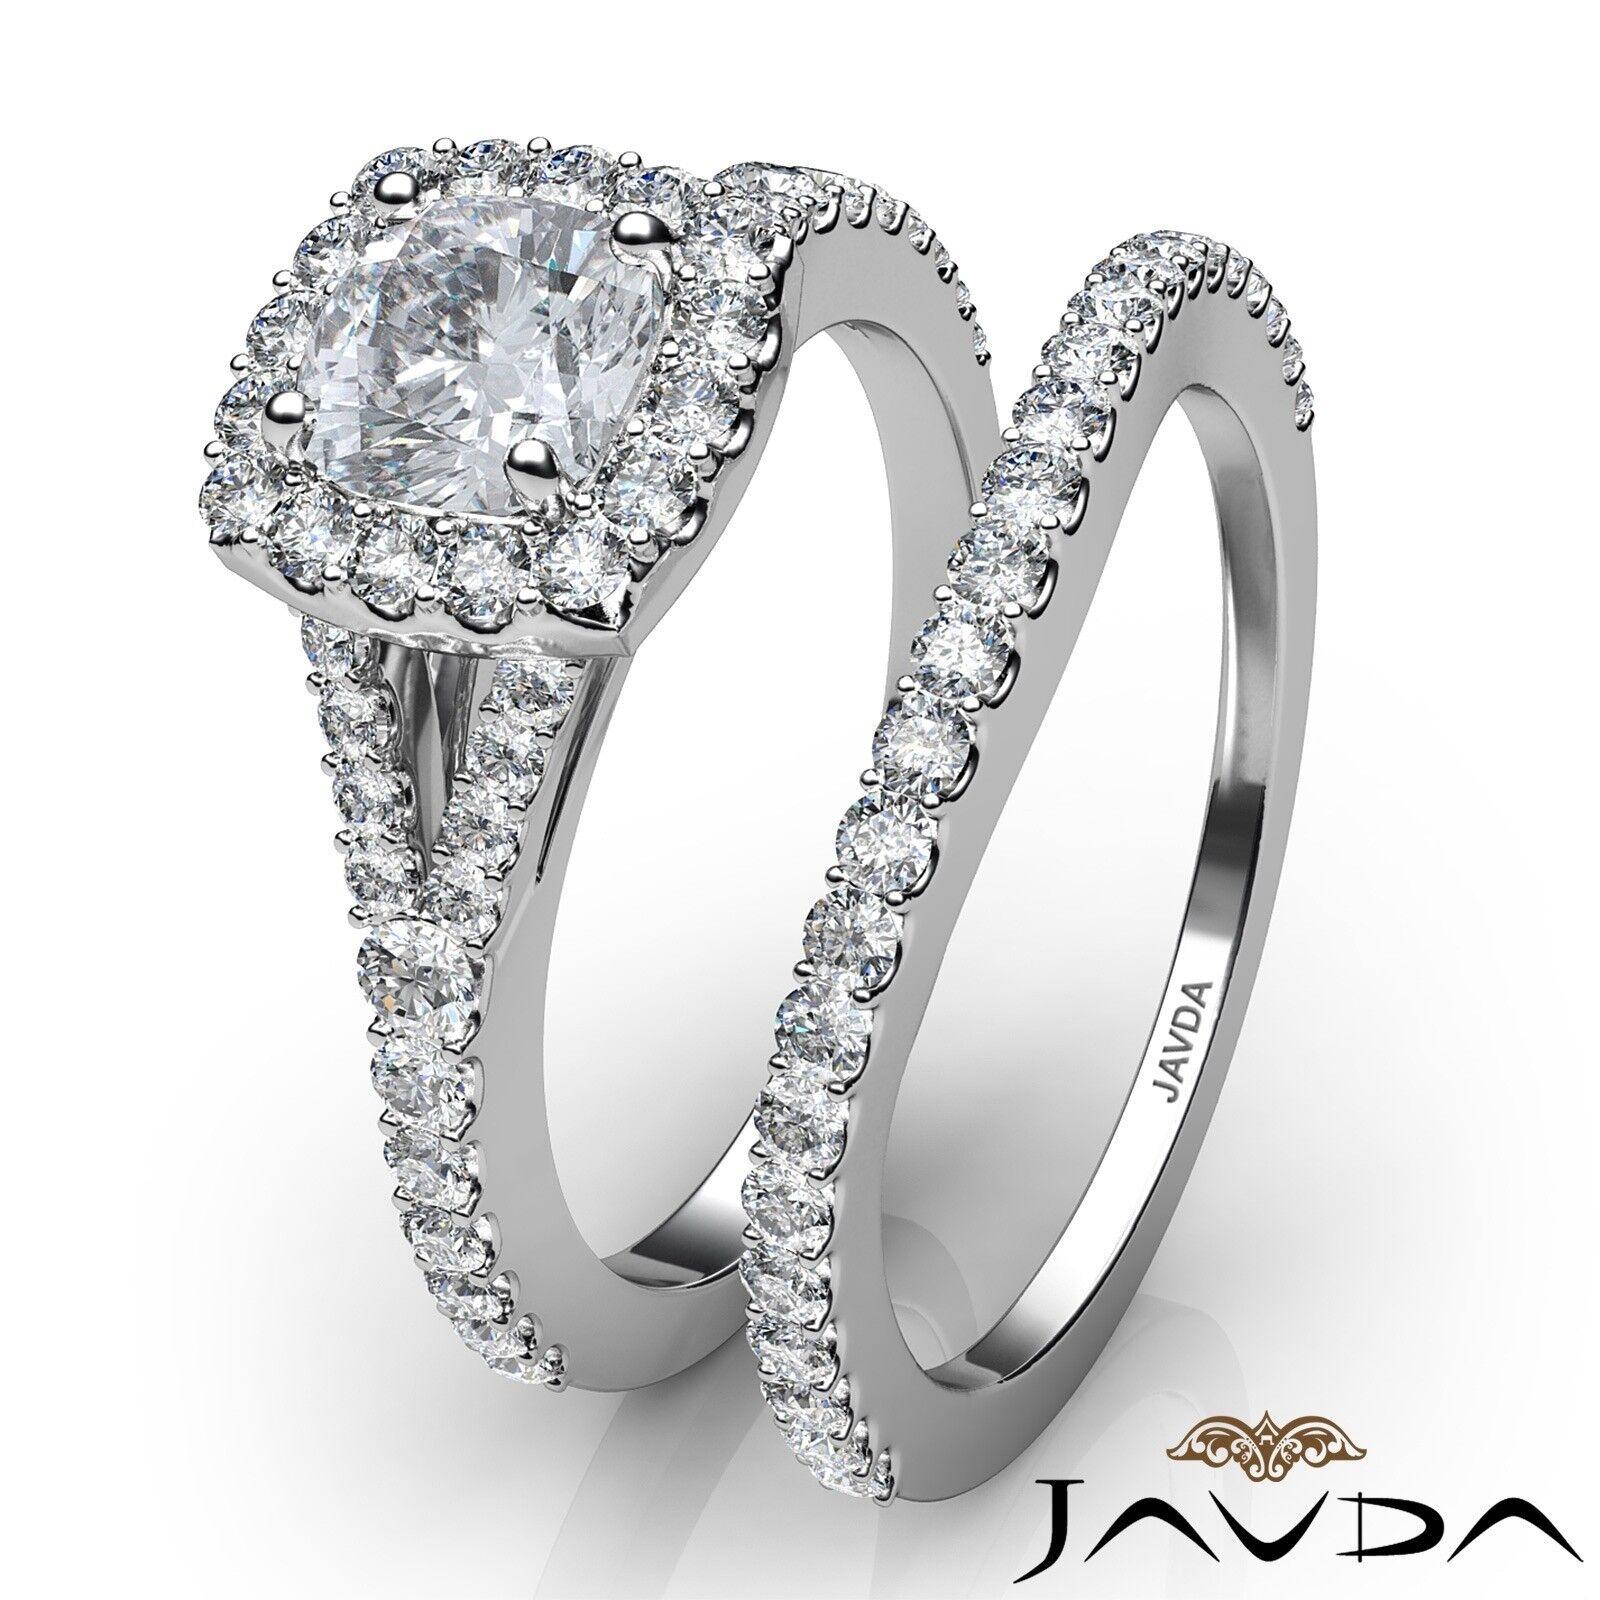 1.5ctw U Cut Pave Halo Bridal Cushion Diamond Engagement Ring GIA F-VS2 W Gold 3